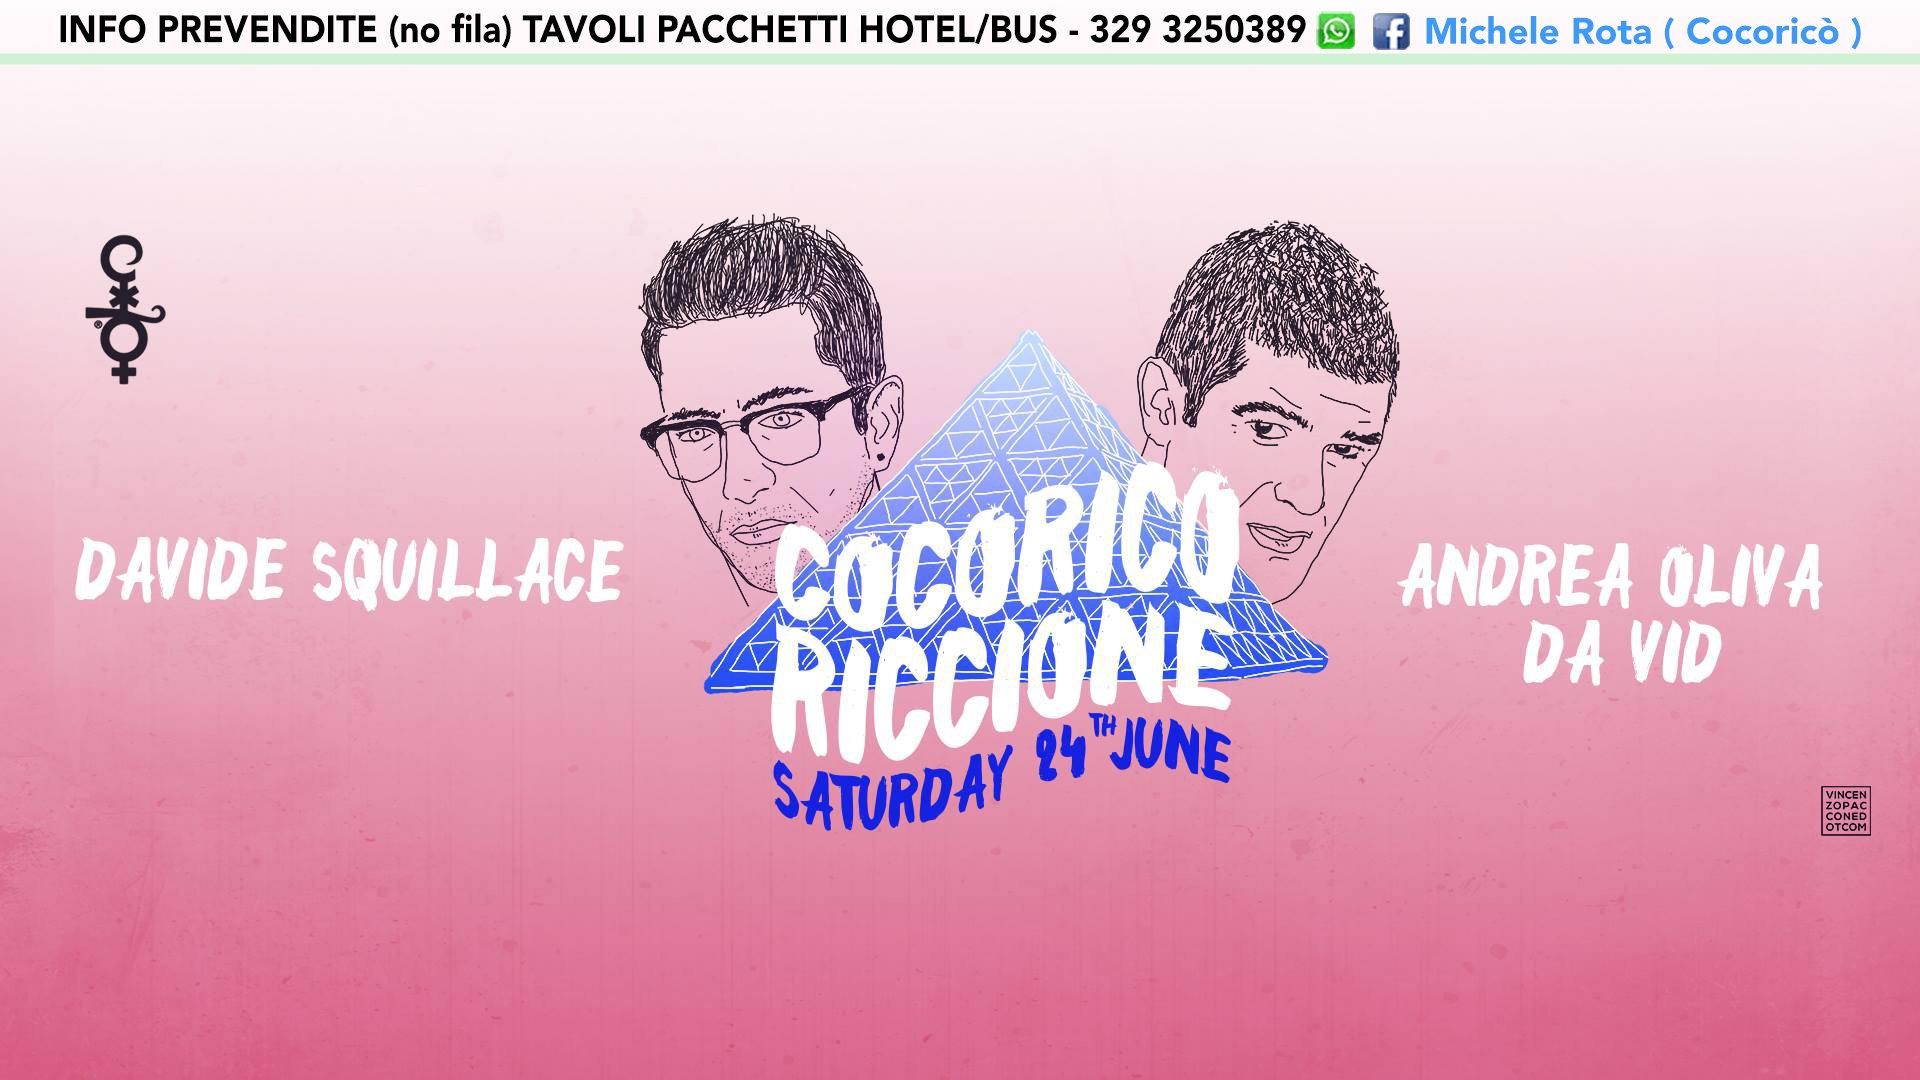 Cocorico 24 06 2017 Davide Squillace Andrea Oliva Ticket Tavoli Hotel